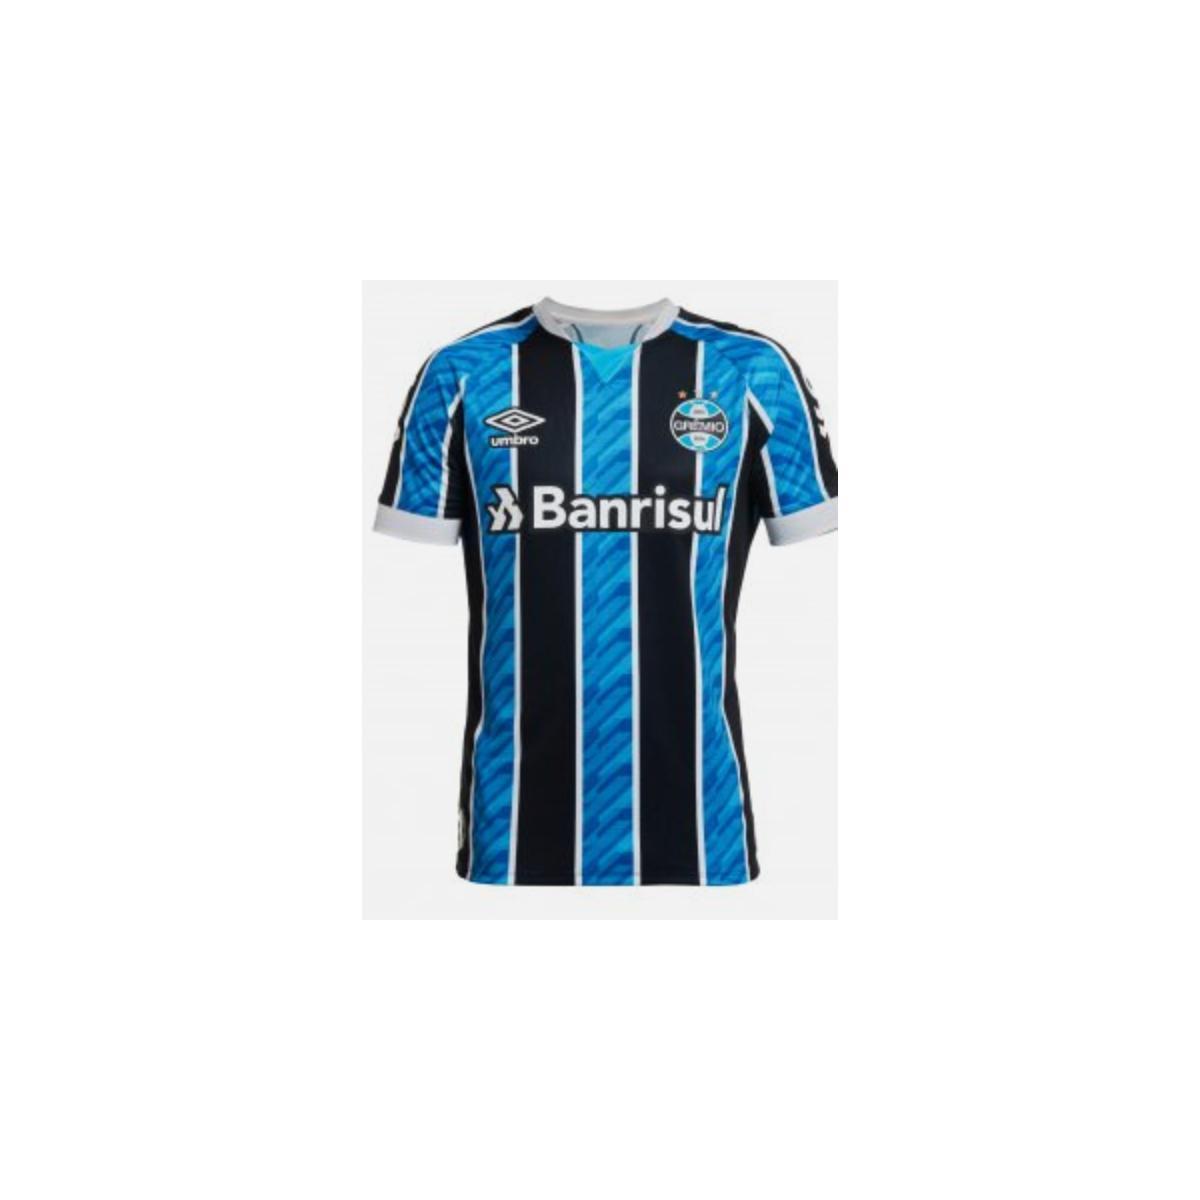 Camiseta Masculina Grêmio 3g161163 of i 2020 Atleta C/n 10 Tricolor